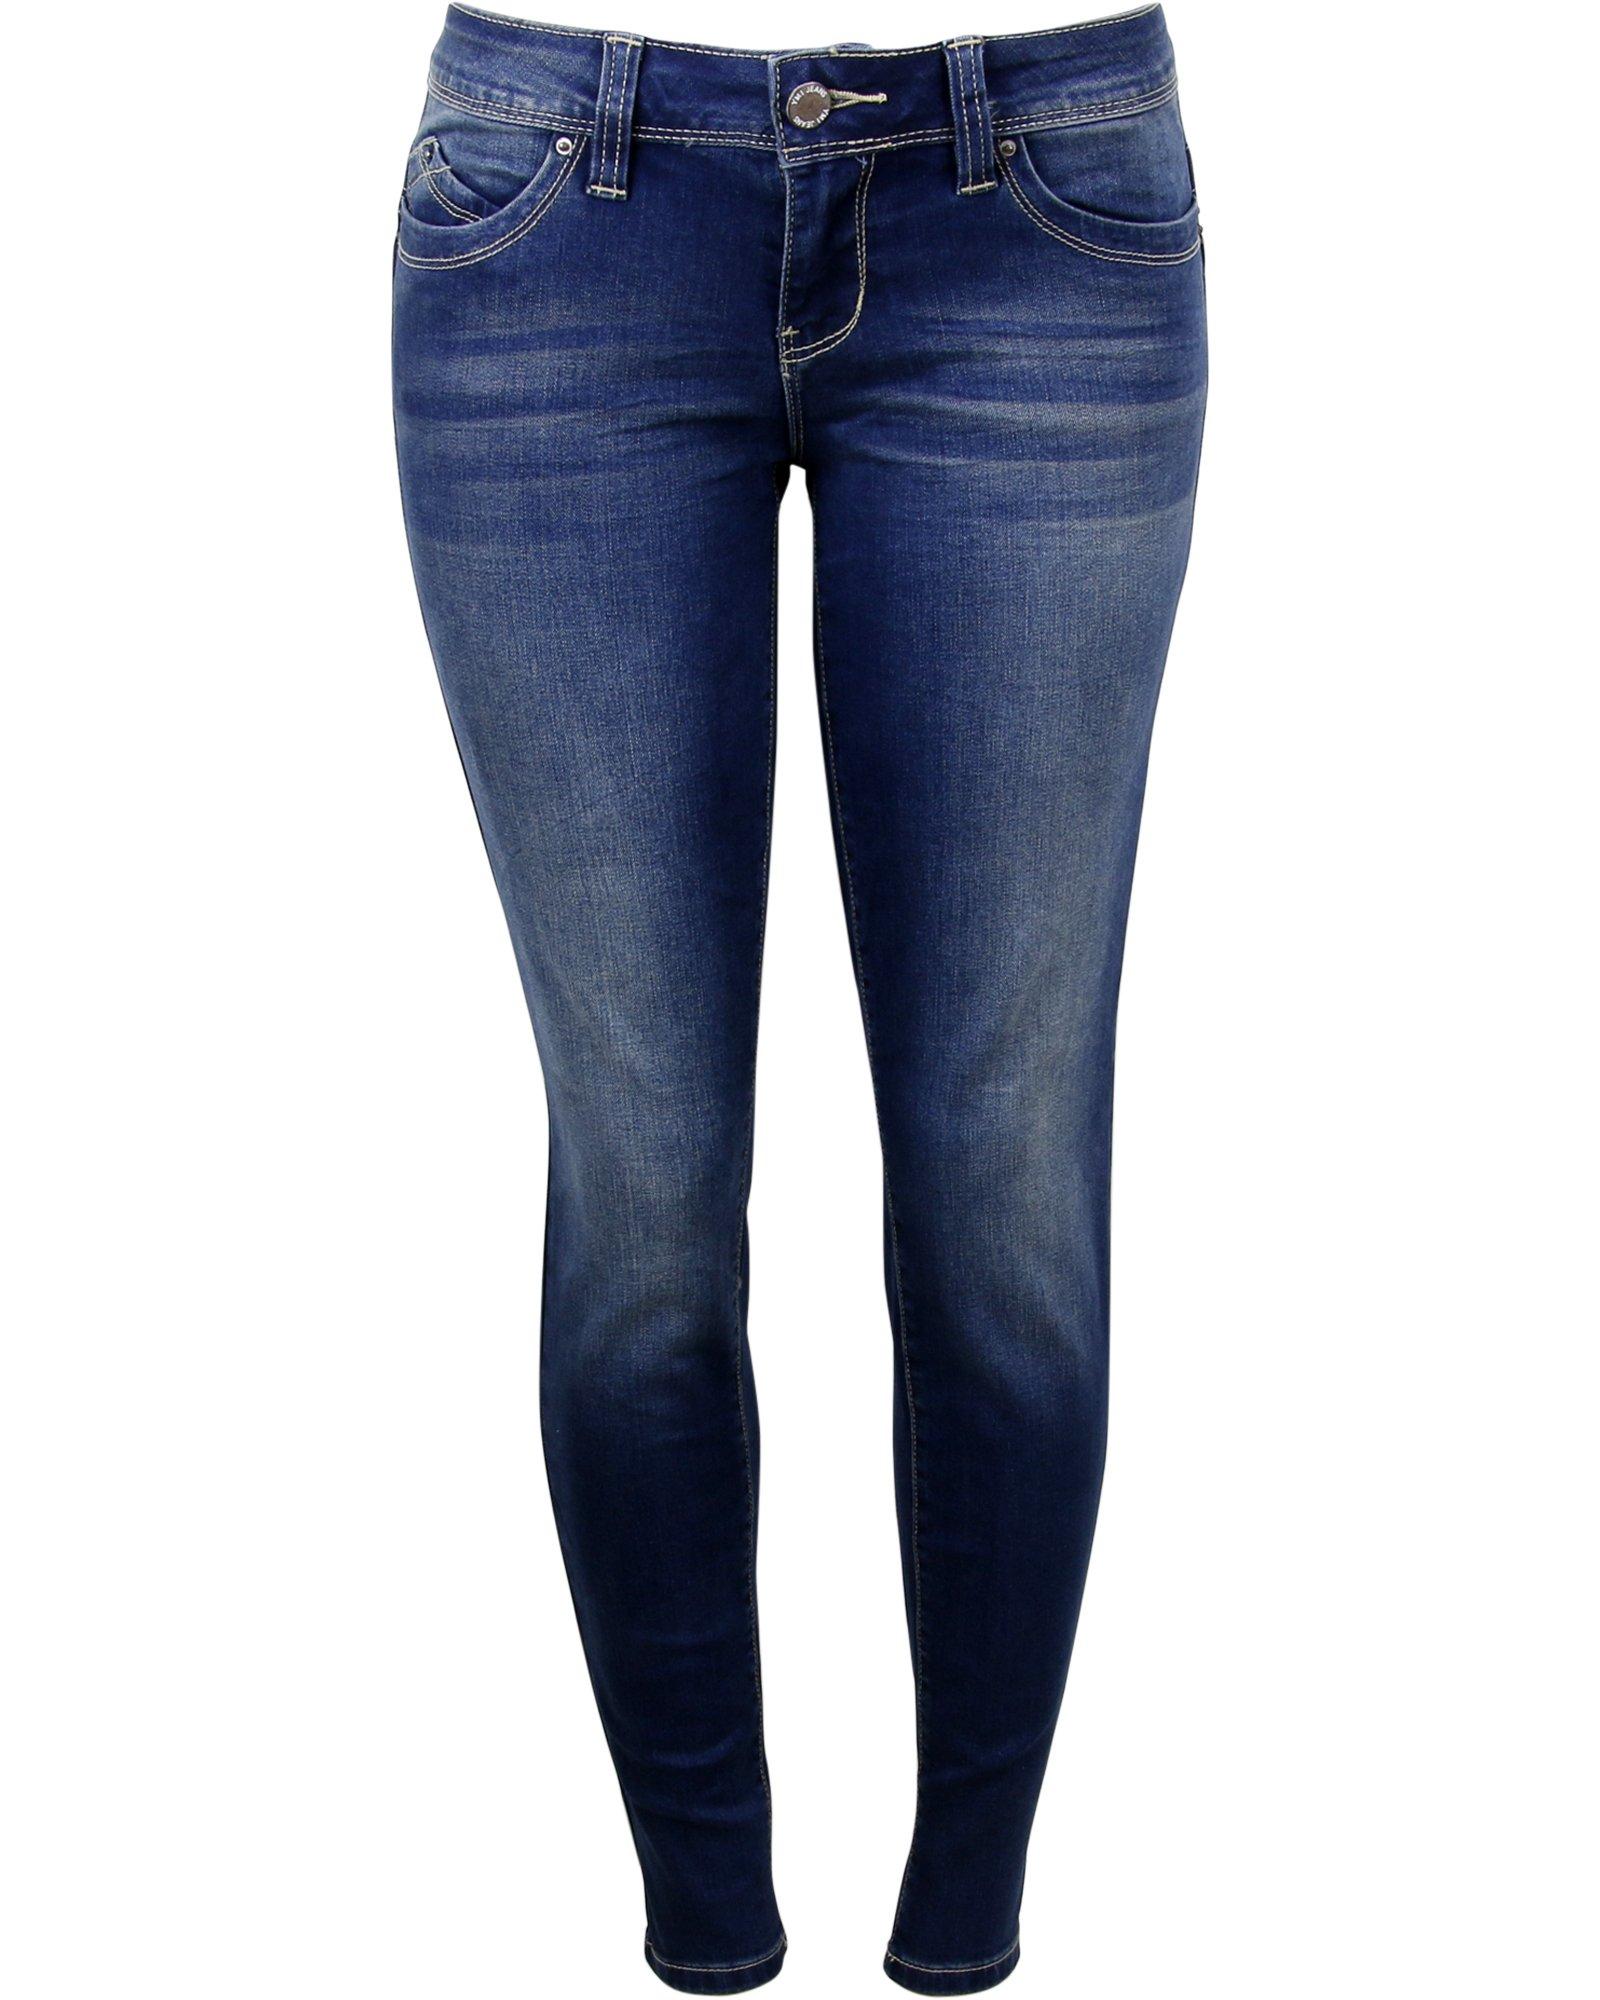 Ymi Women's Betta Butt Jeans,Dark,3